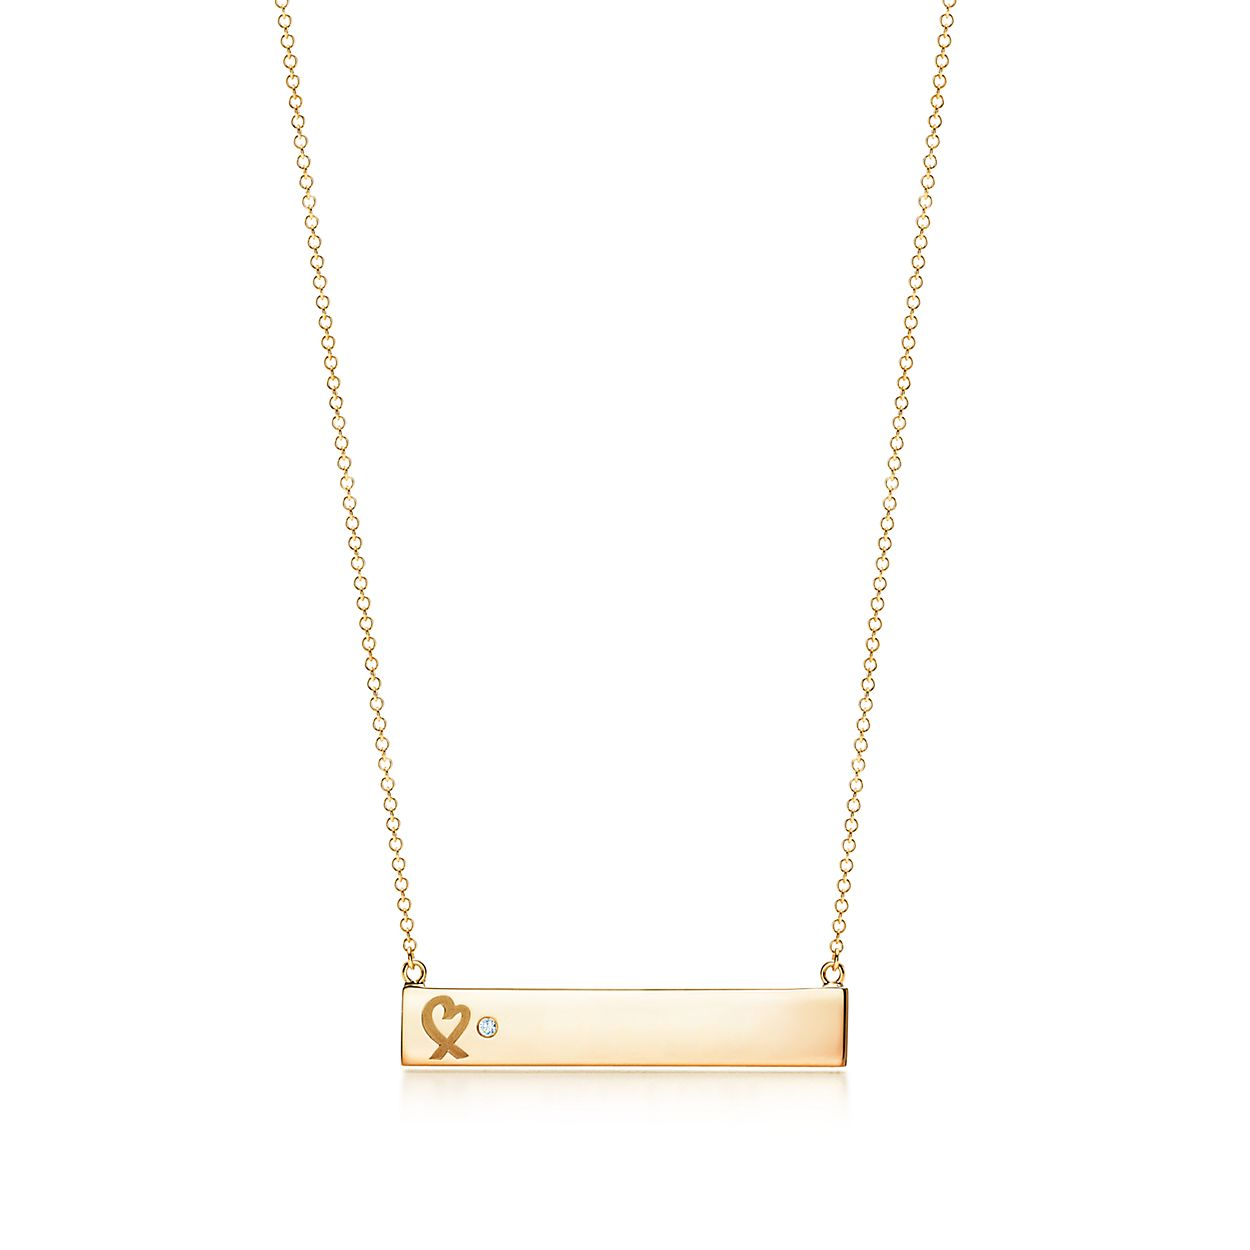 Paloma Bar Coeur Picasso Amour Pendentif En Or Rose 18 Carats Avec Un Diamant Tiffany & Co. UDGLPdzU5d